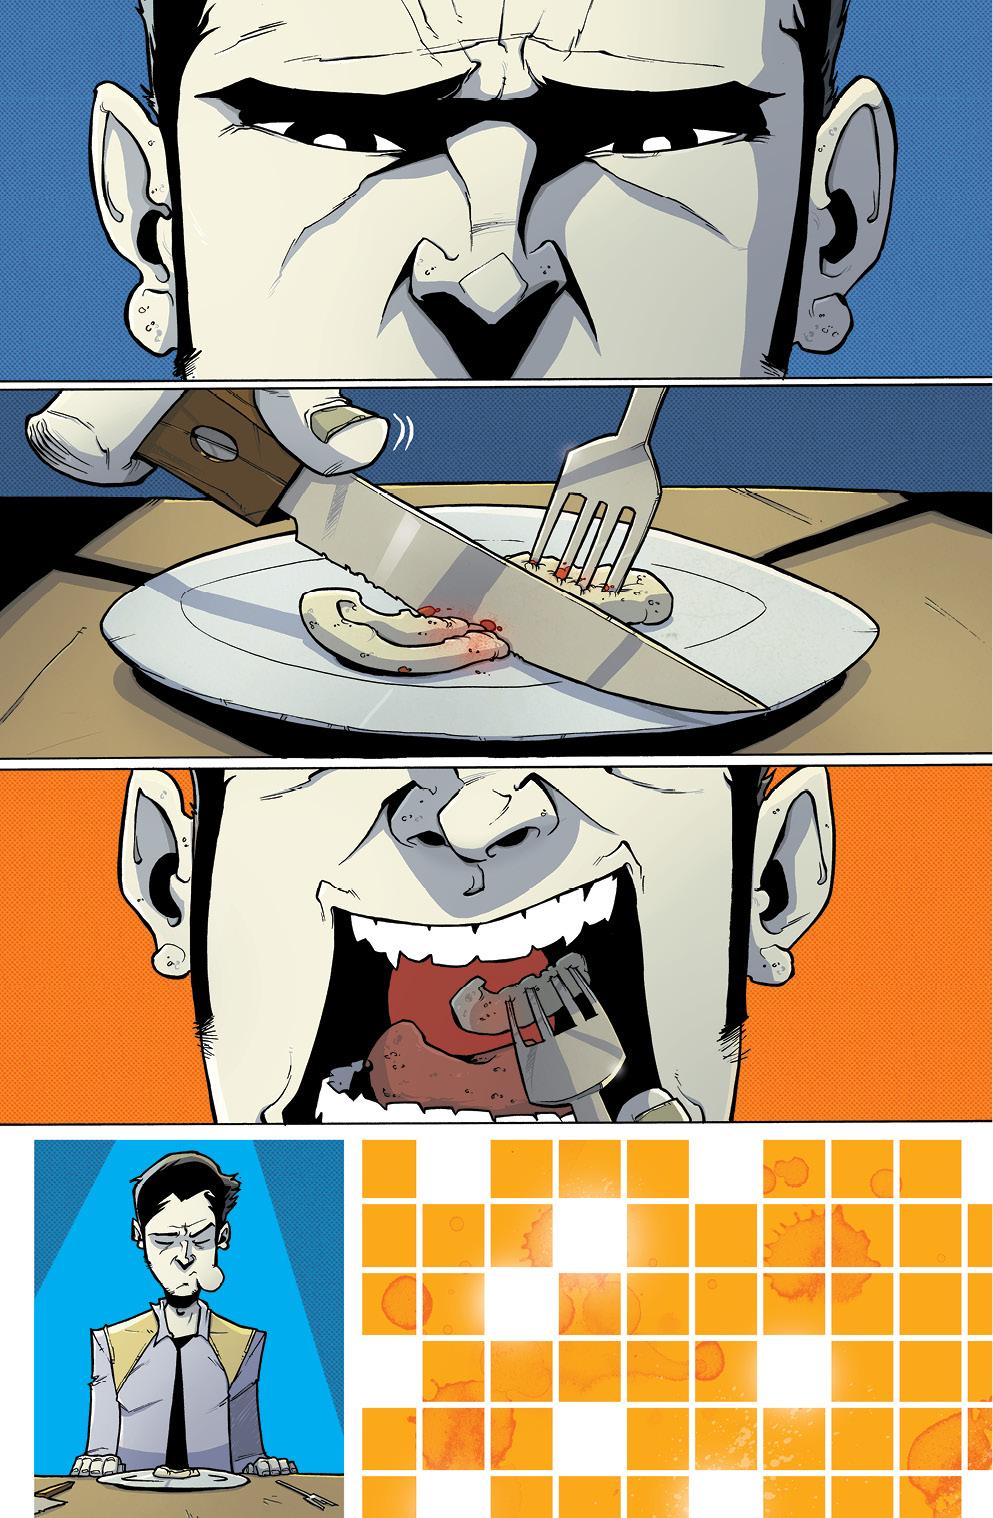 Tony CHU vol. 12: Maus Vinhos